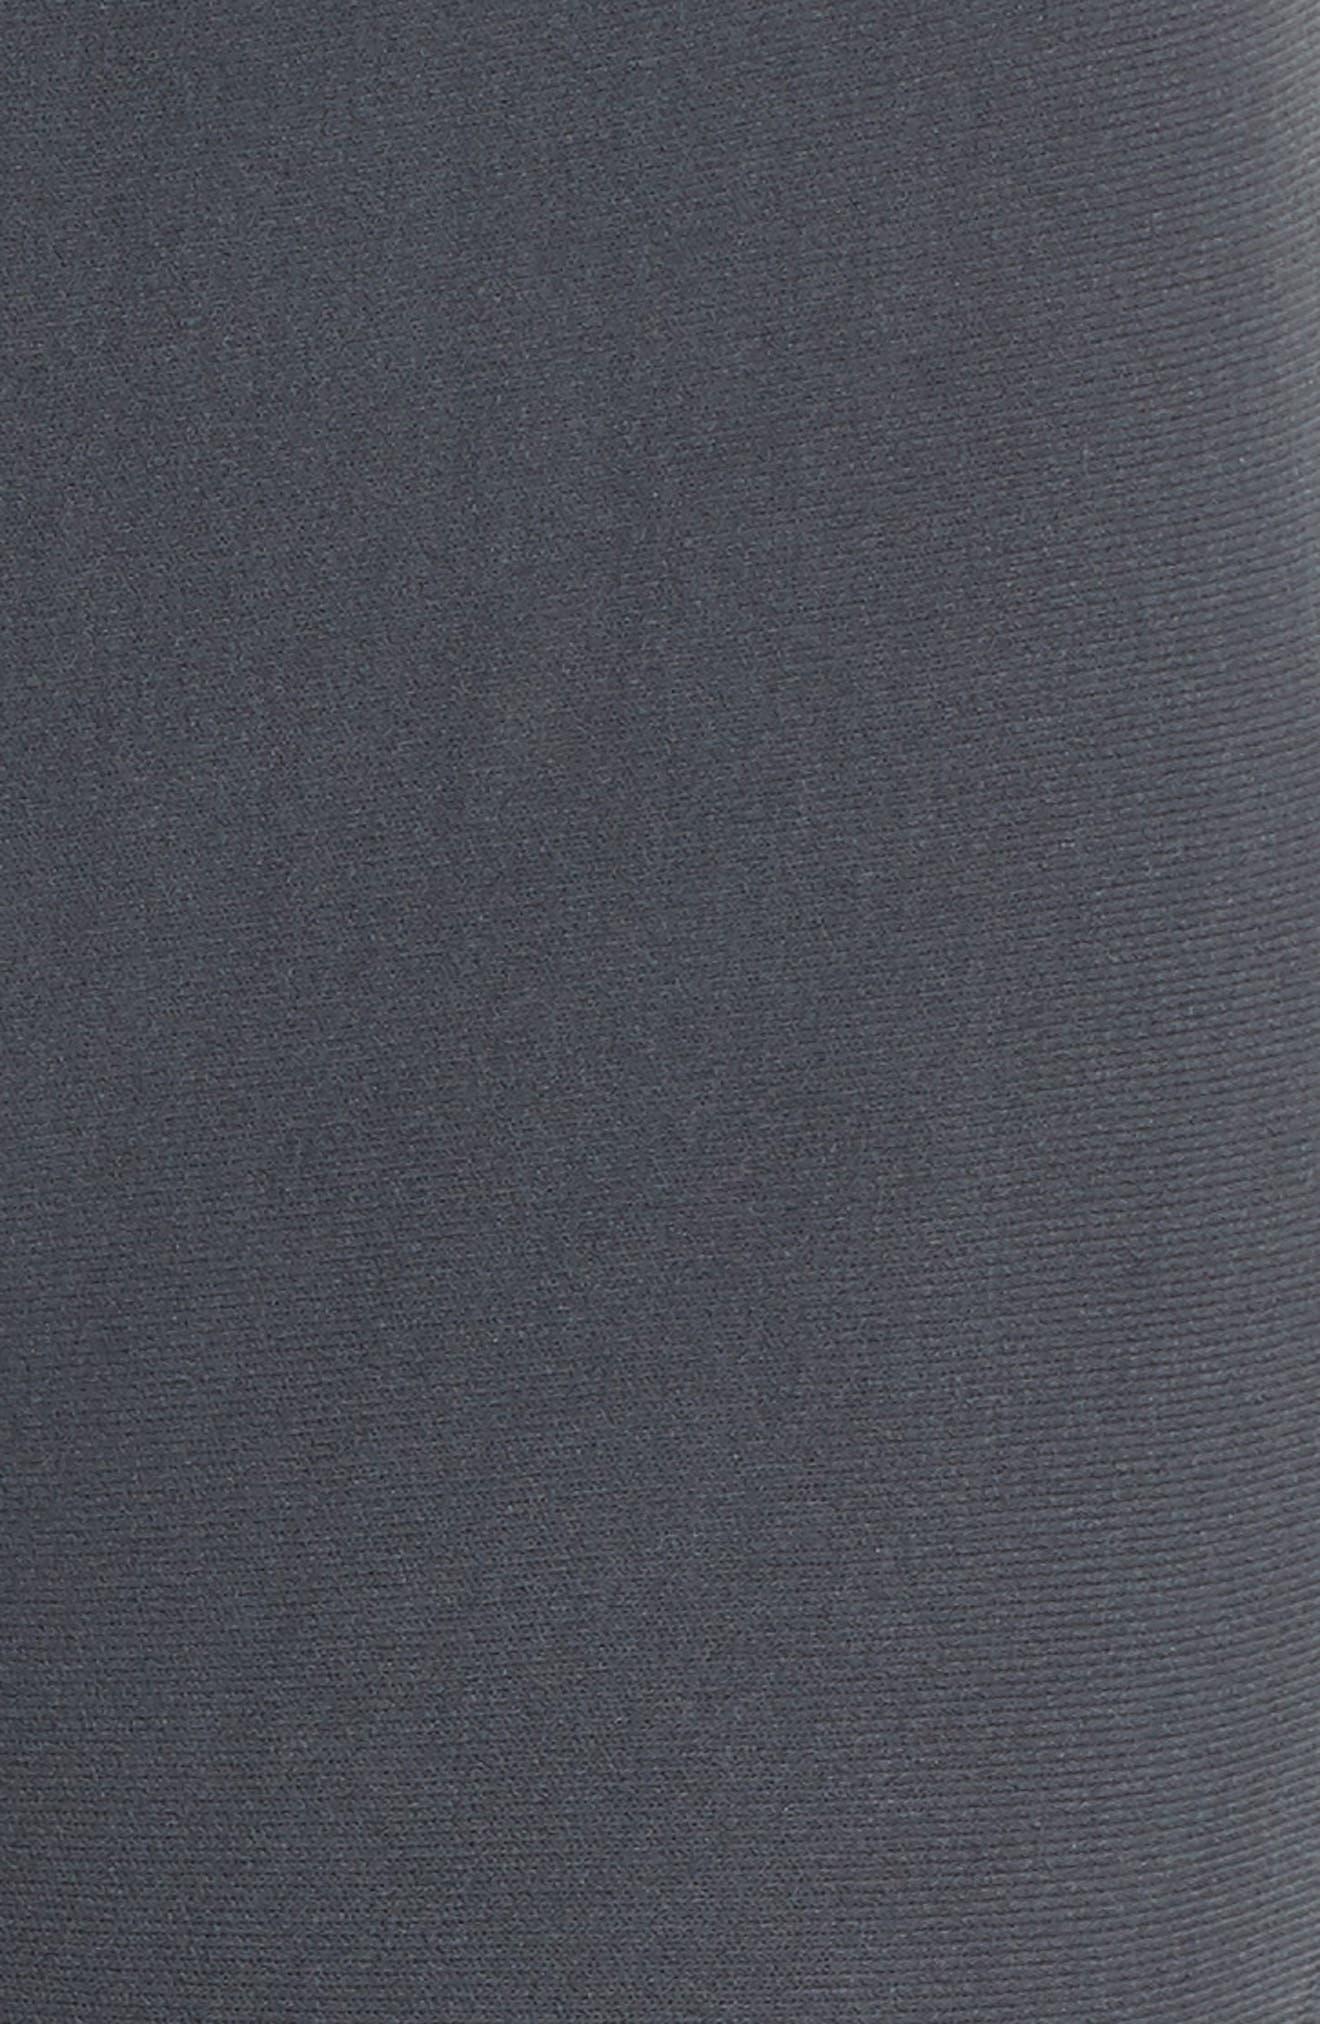 Warp Climacool<sup>®</sup> Knit Tights,                             Alternate thumbnail 5, color,                             Carbon/ Black